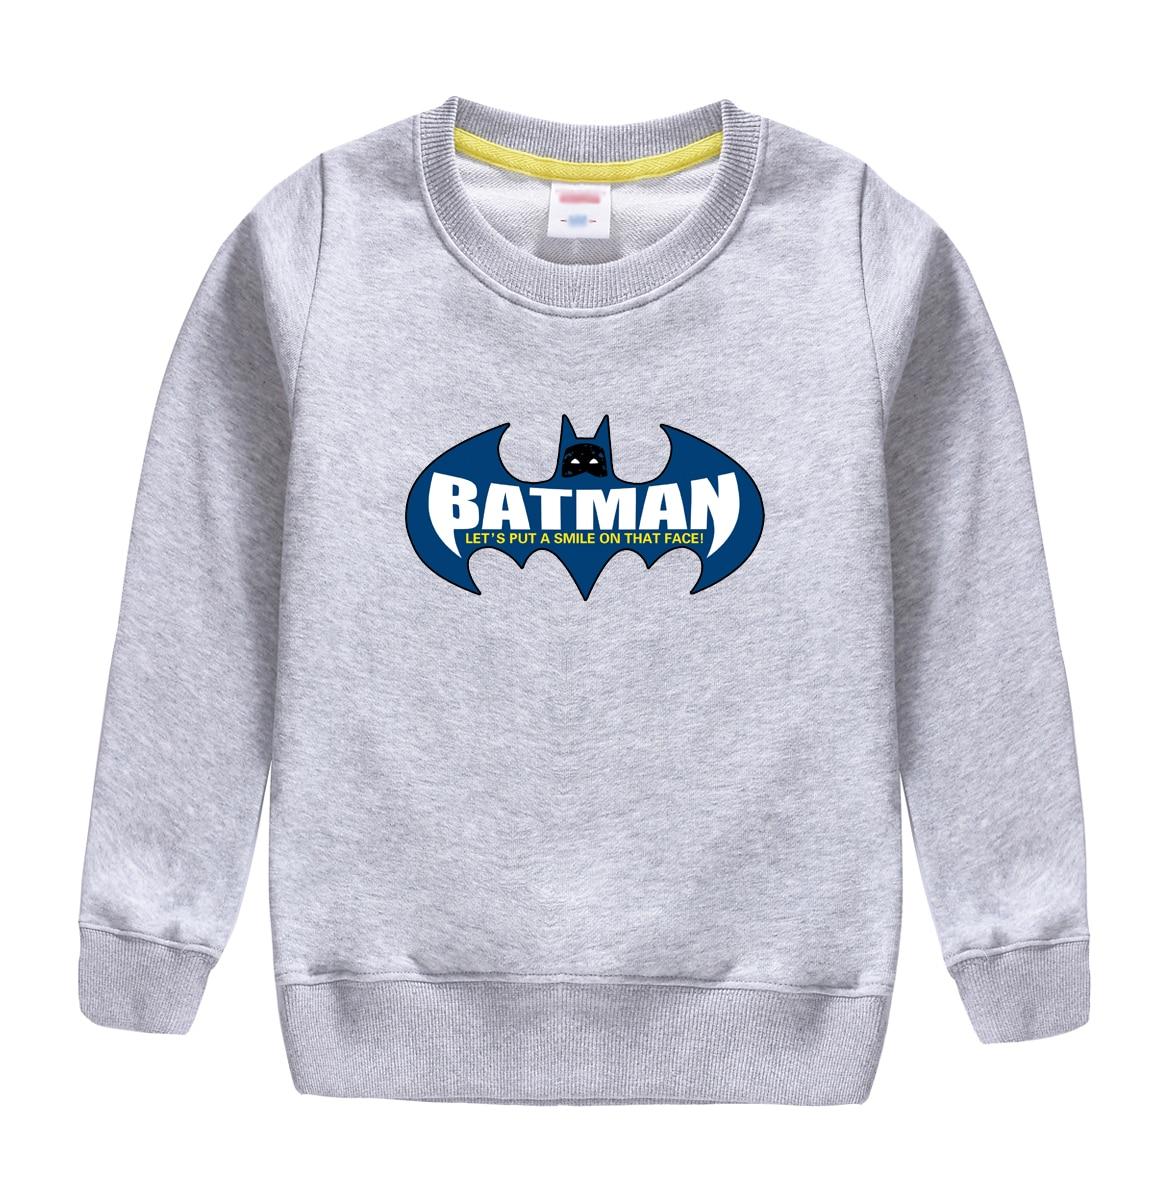 BATMAN pattern printed childrens hooded clothing winter autumn sweatshirt design for 4-13 t kids top soft t-shirts